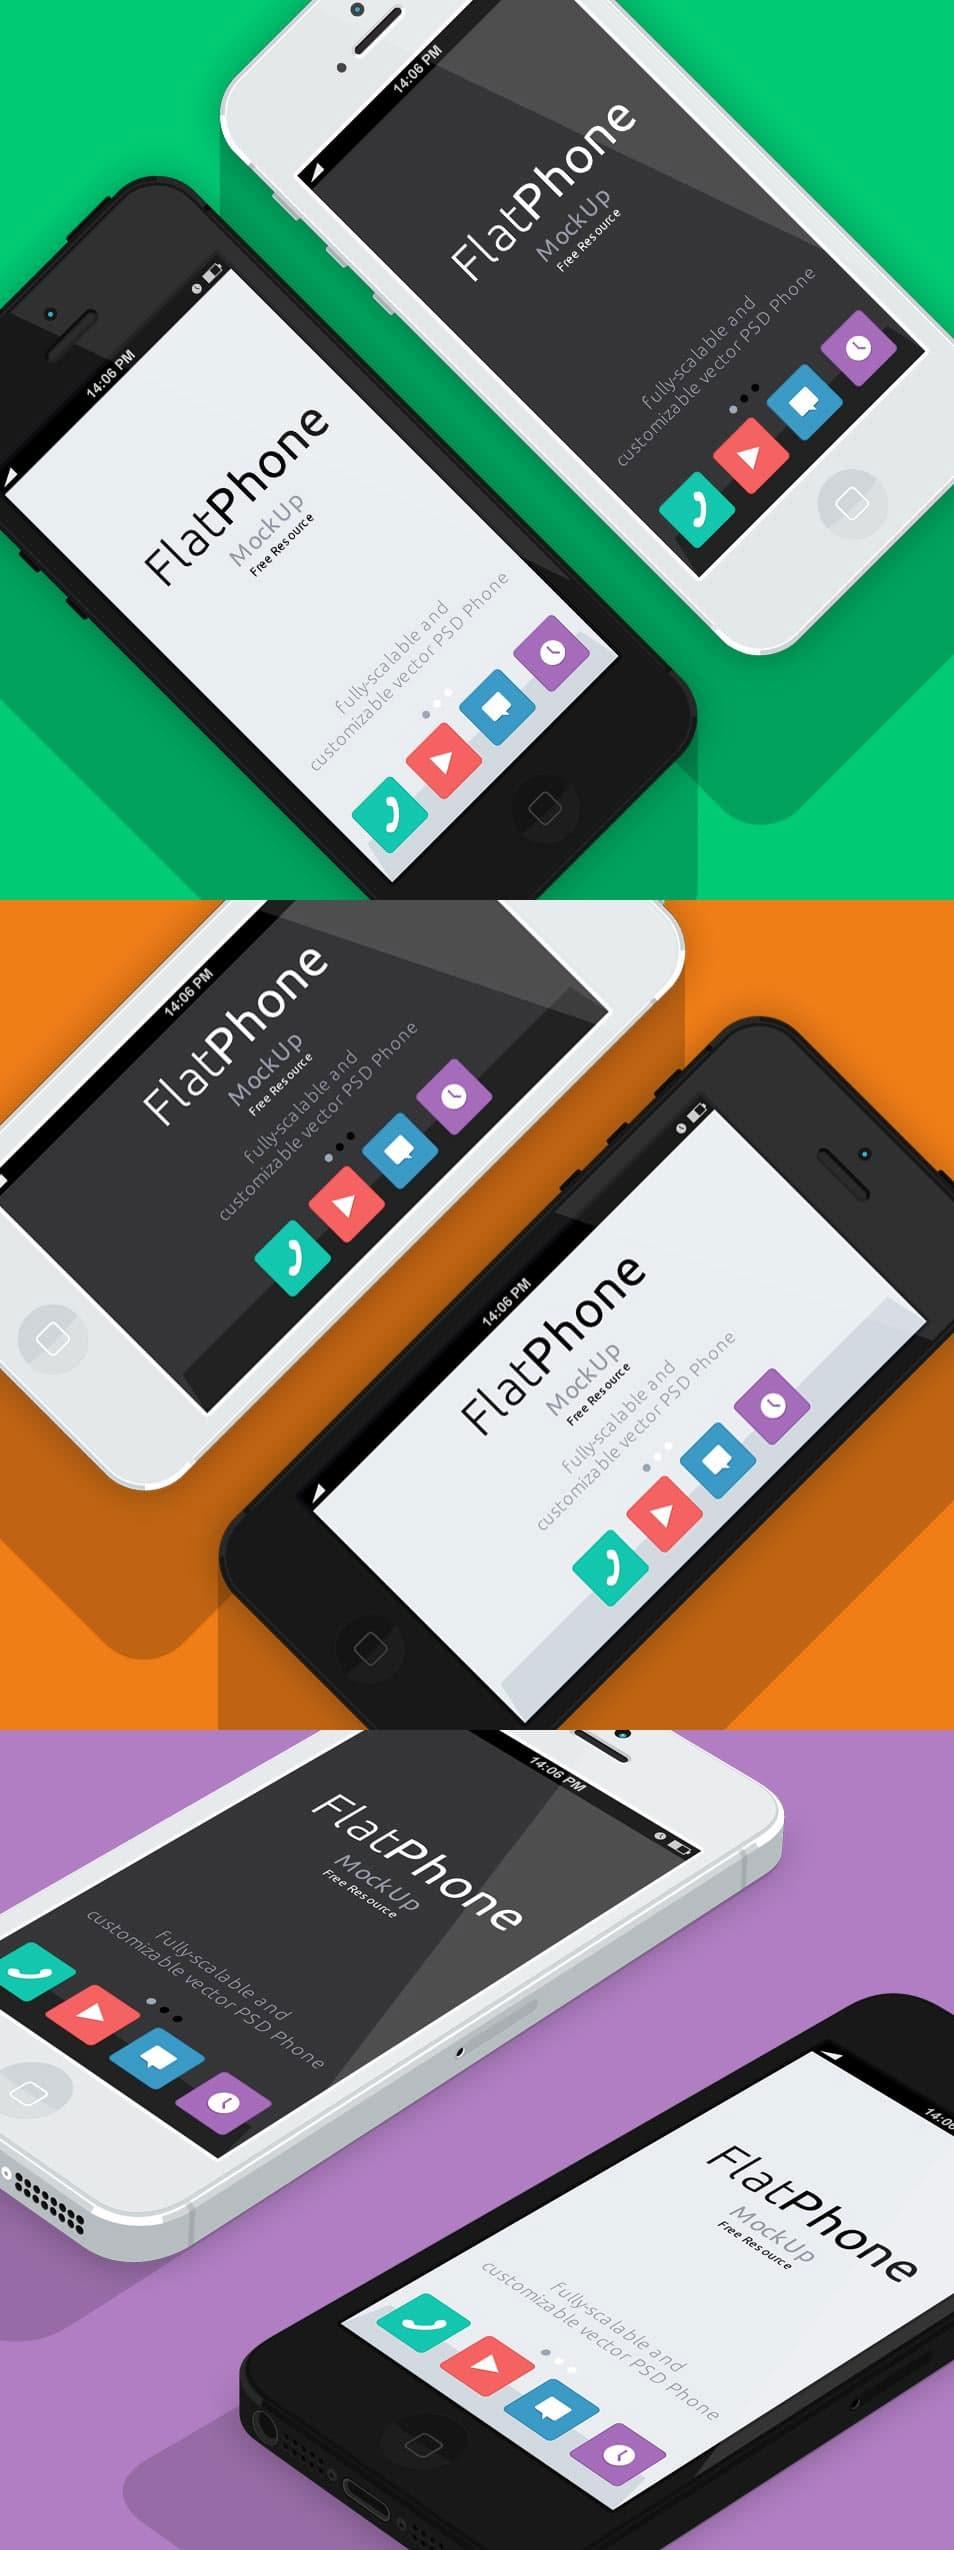 iPhone 5 Psd Flat Design Mockup